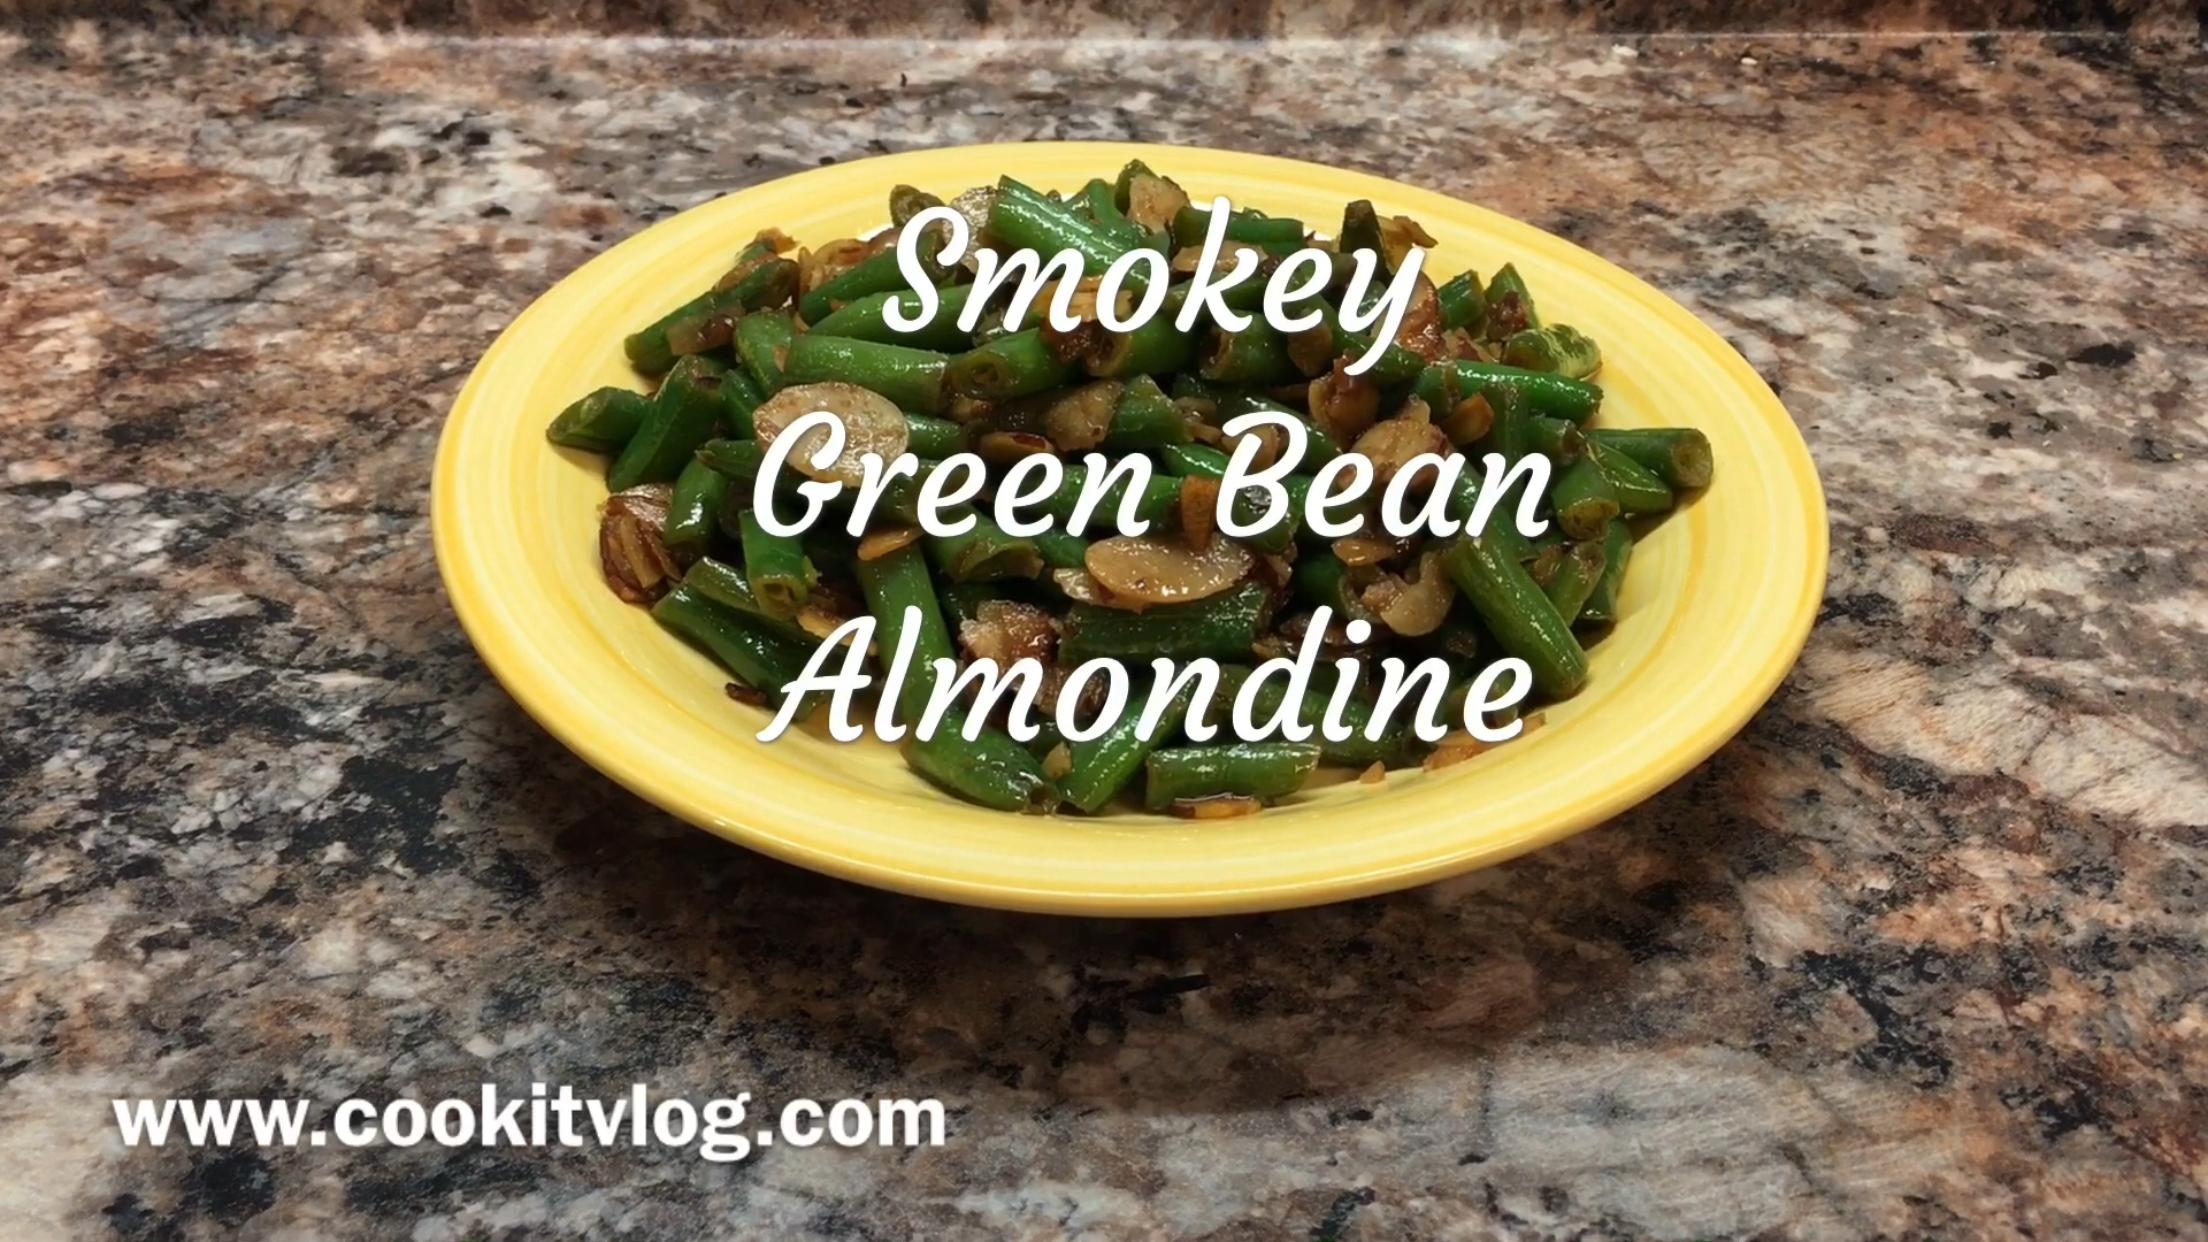 Smokey Green Bean Almondine Recipe